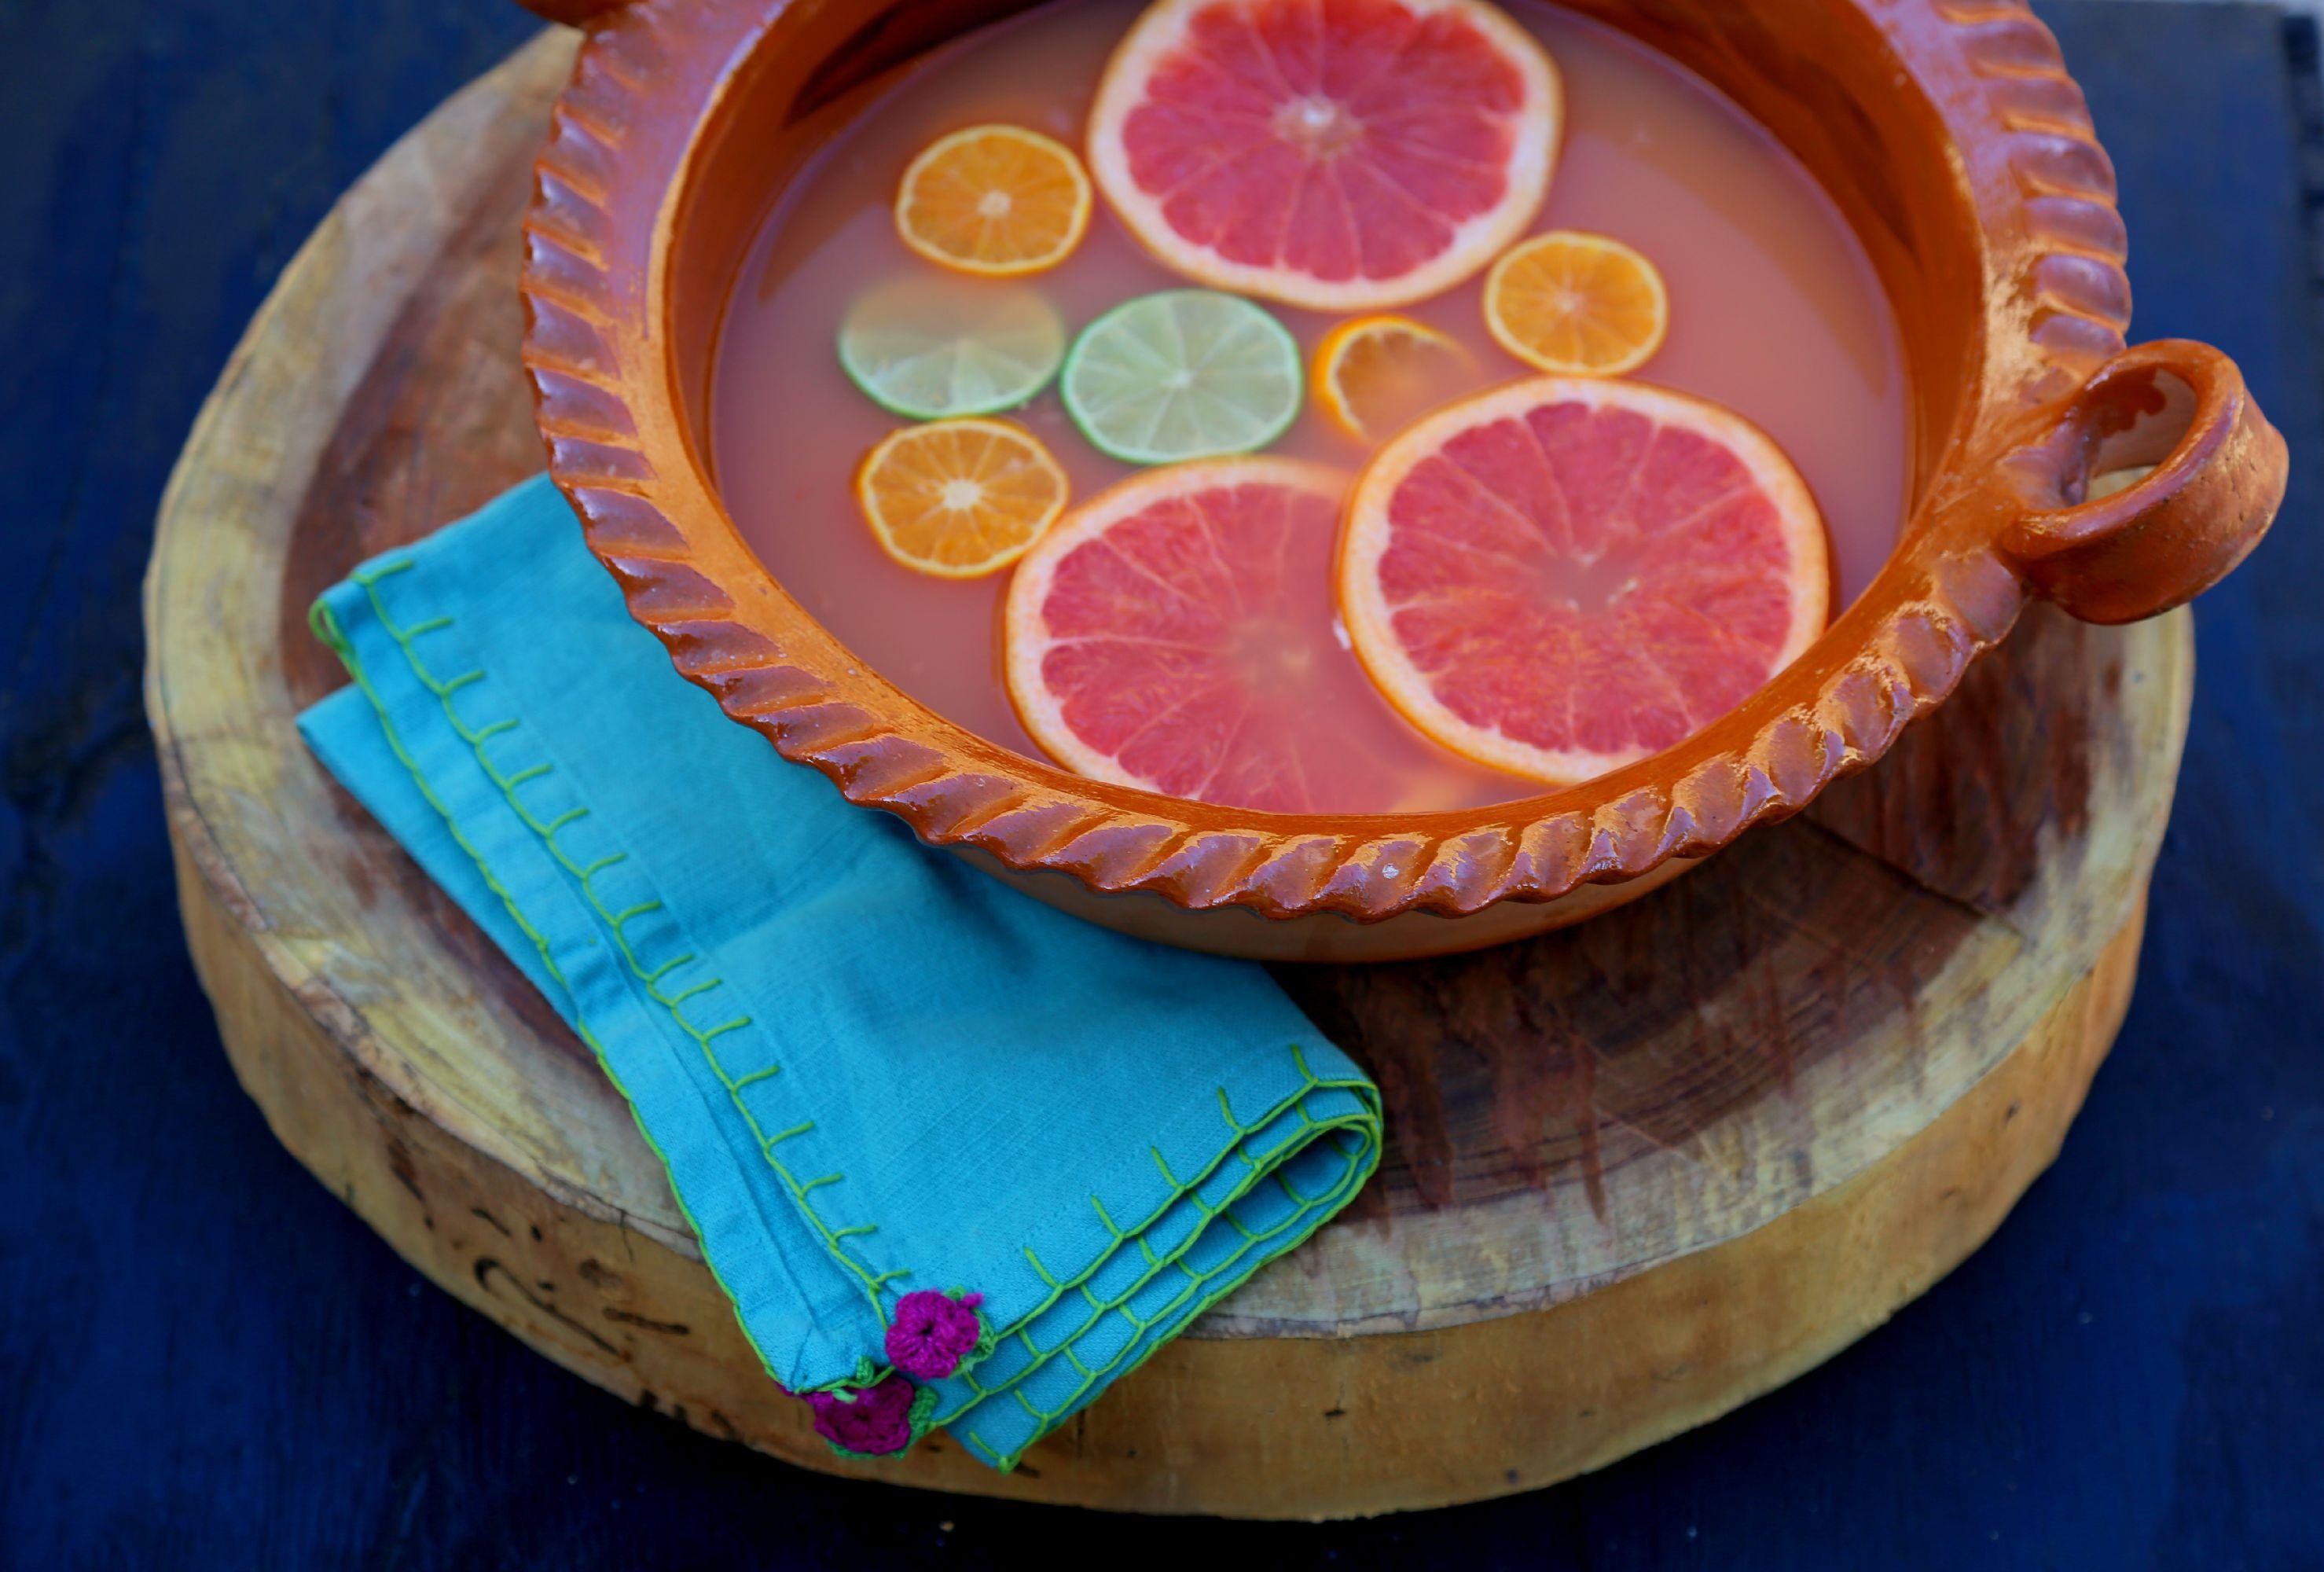 cazuela-voladora-cocktail-paloma-vianneyrodriguez-sweetlifebake